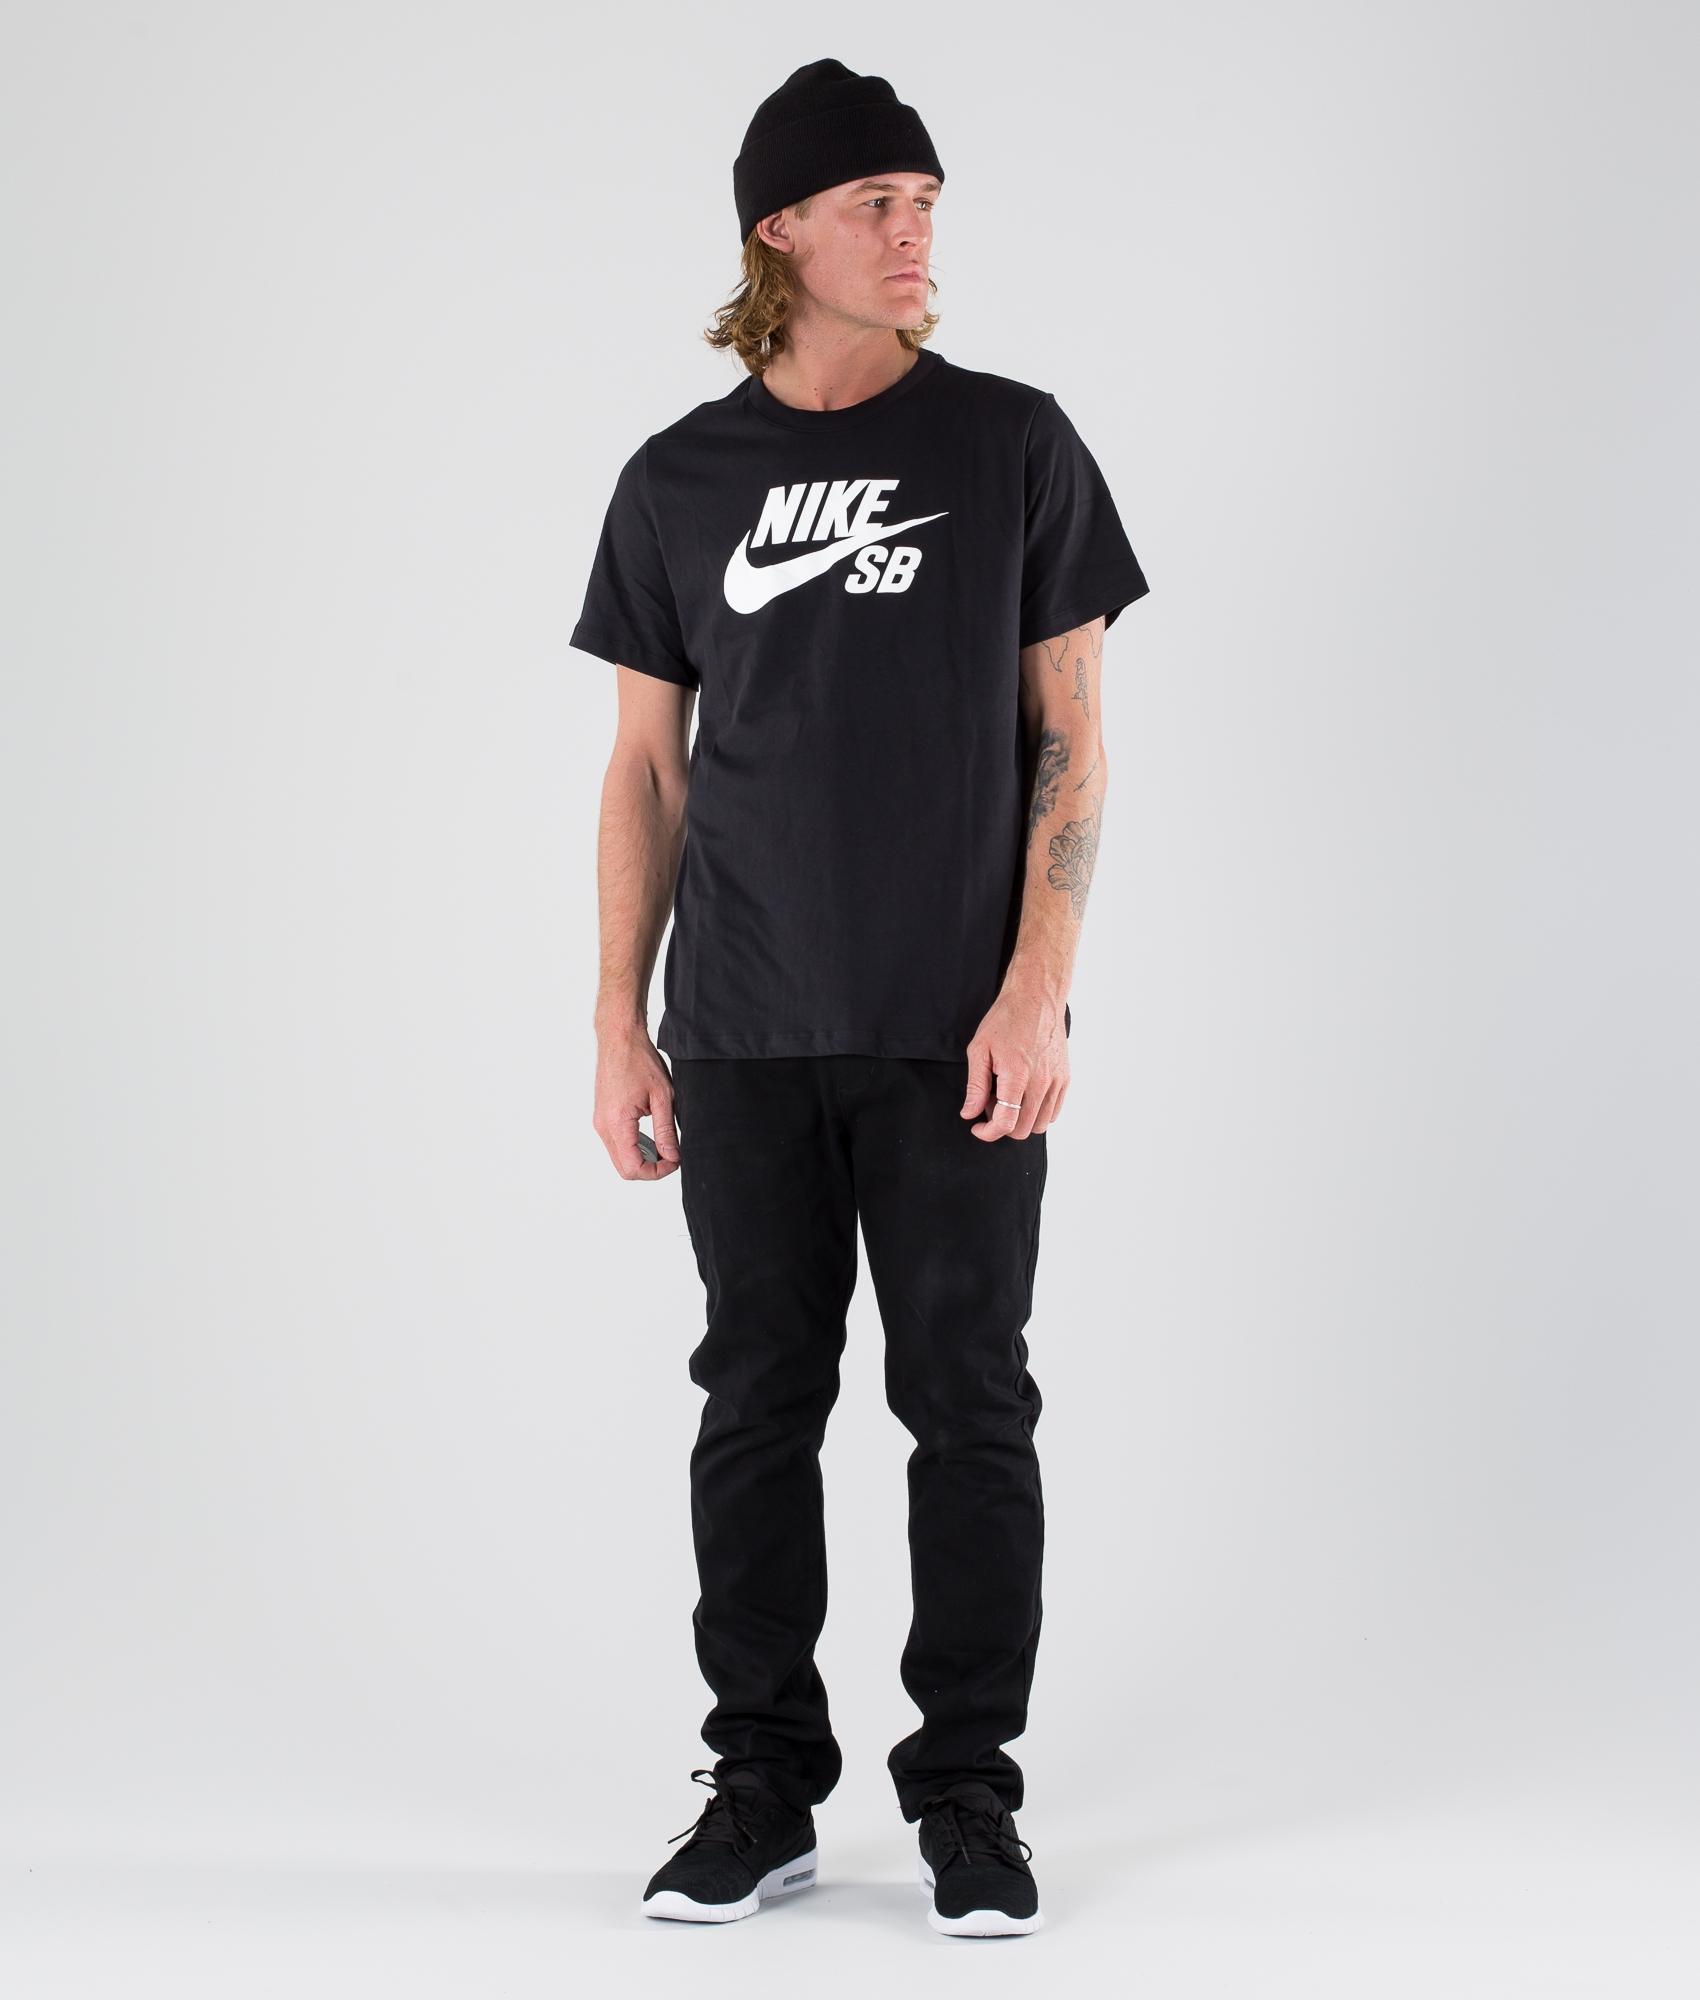 Nike SB Logo Snsl 2 Black Outfit Ridestore